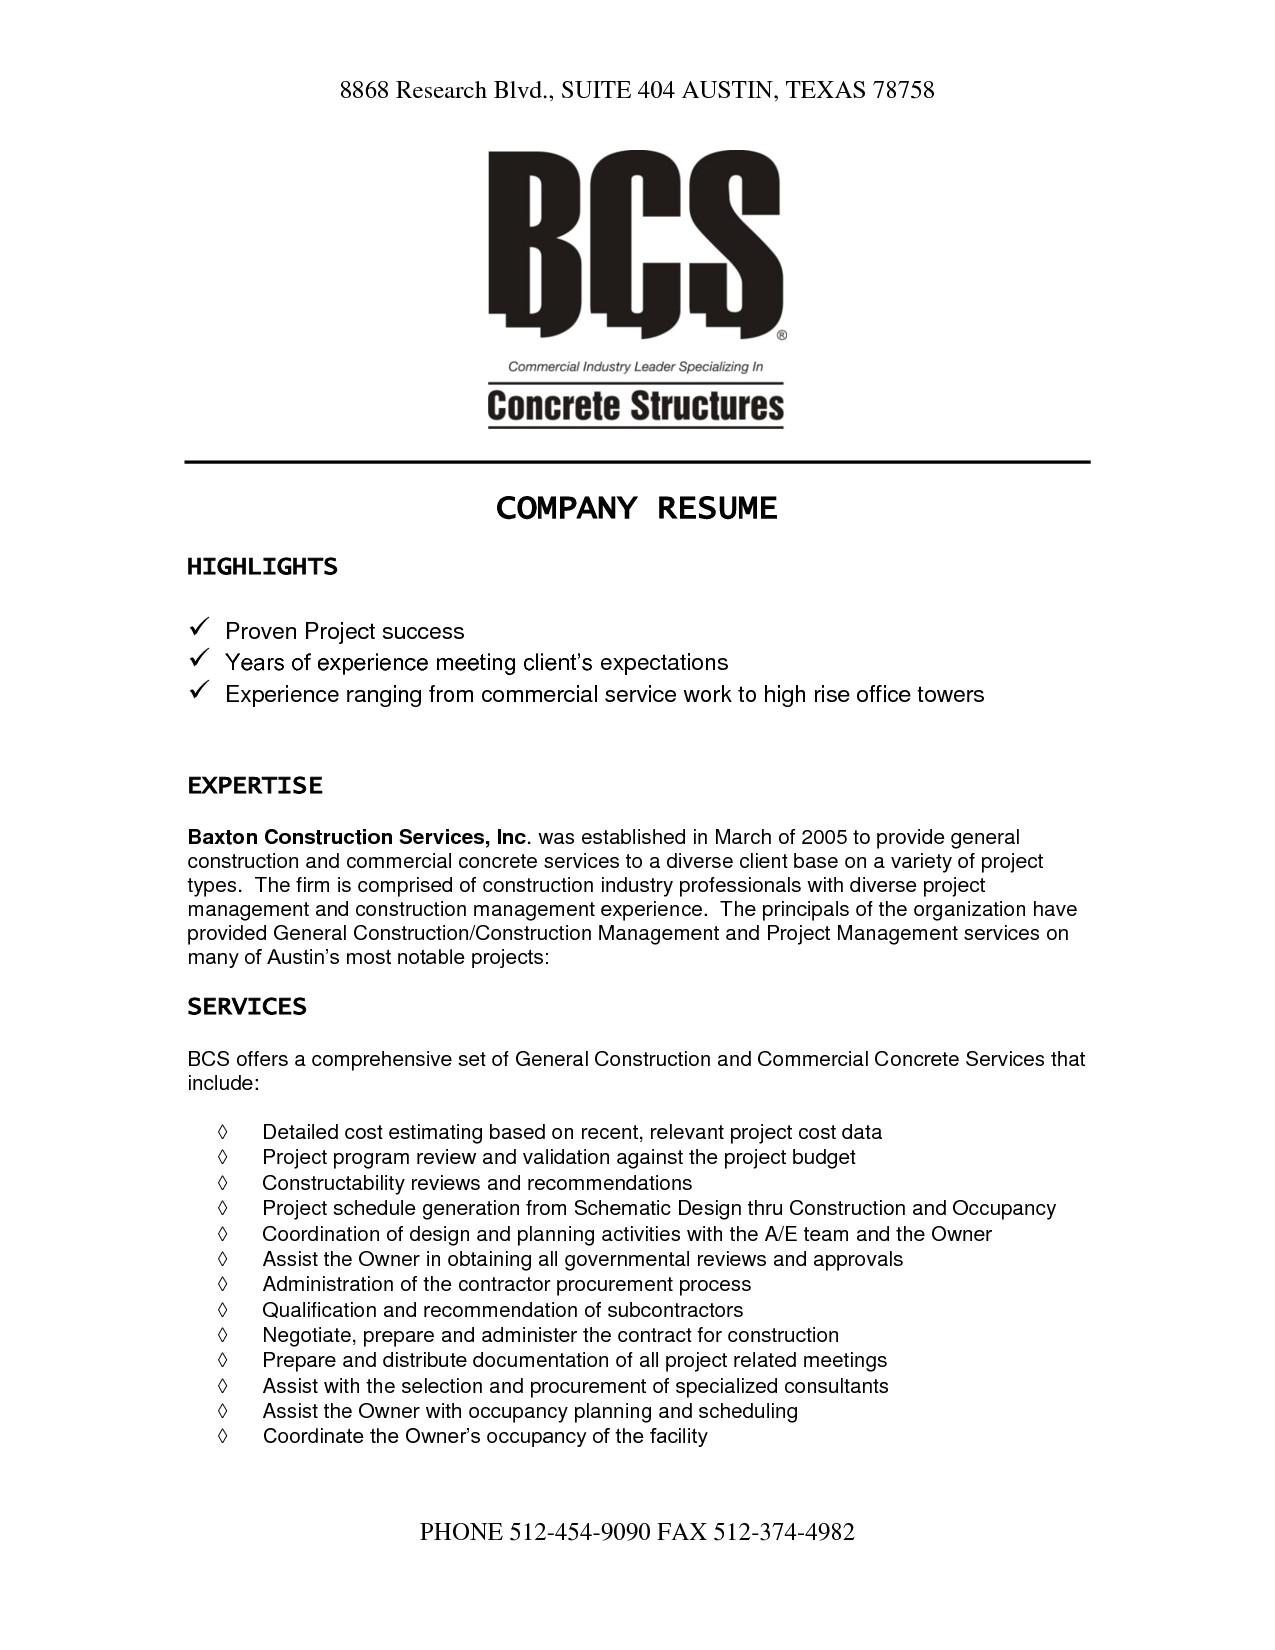 Resume format for Company Job Construction Company Resume Template Resume Templates